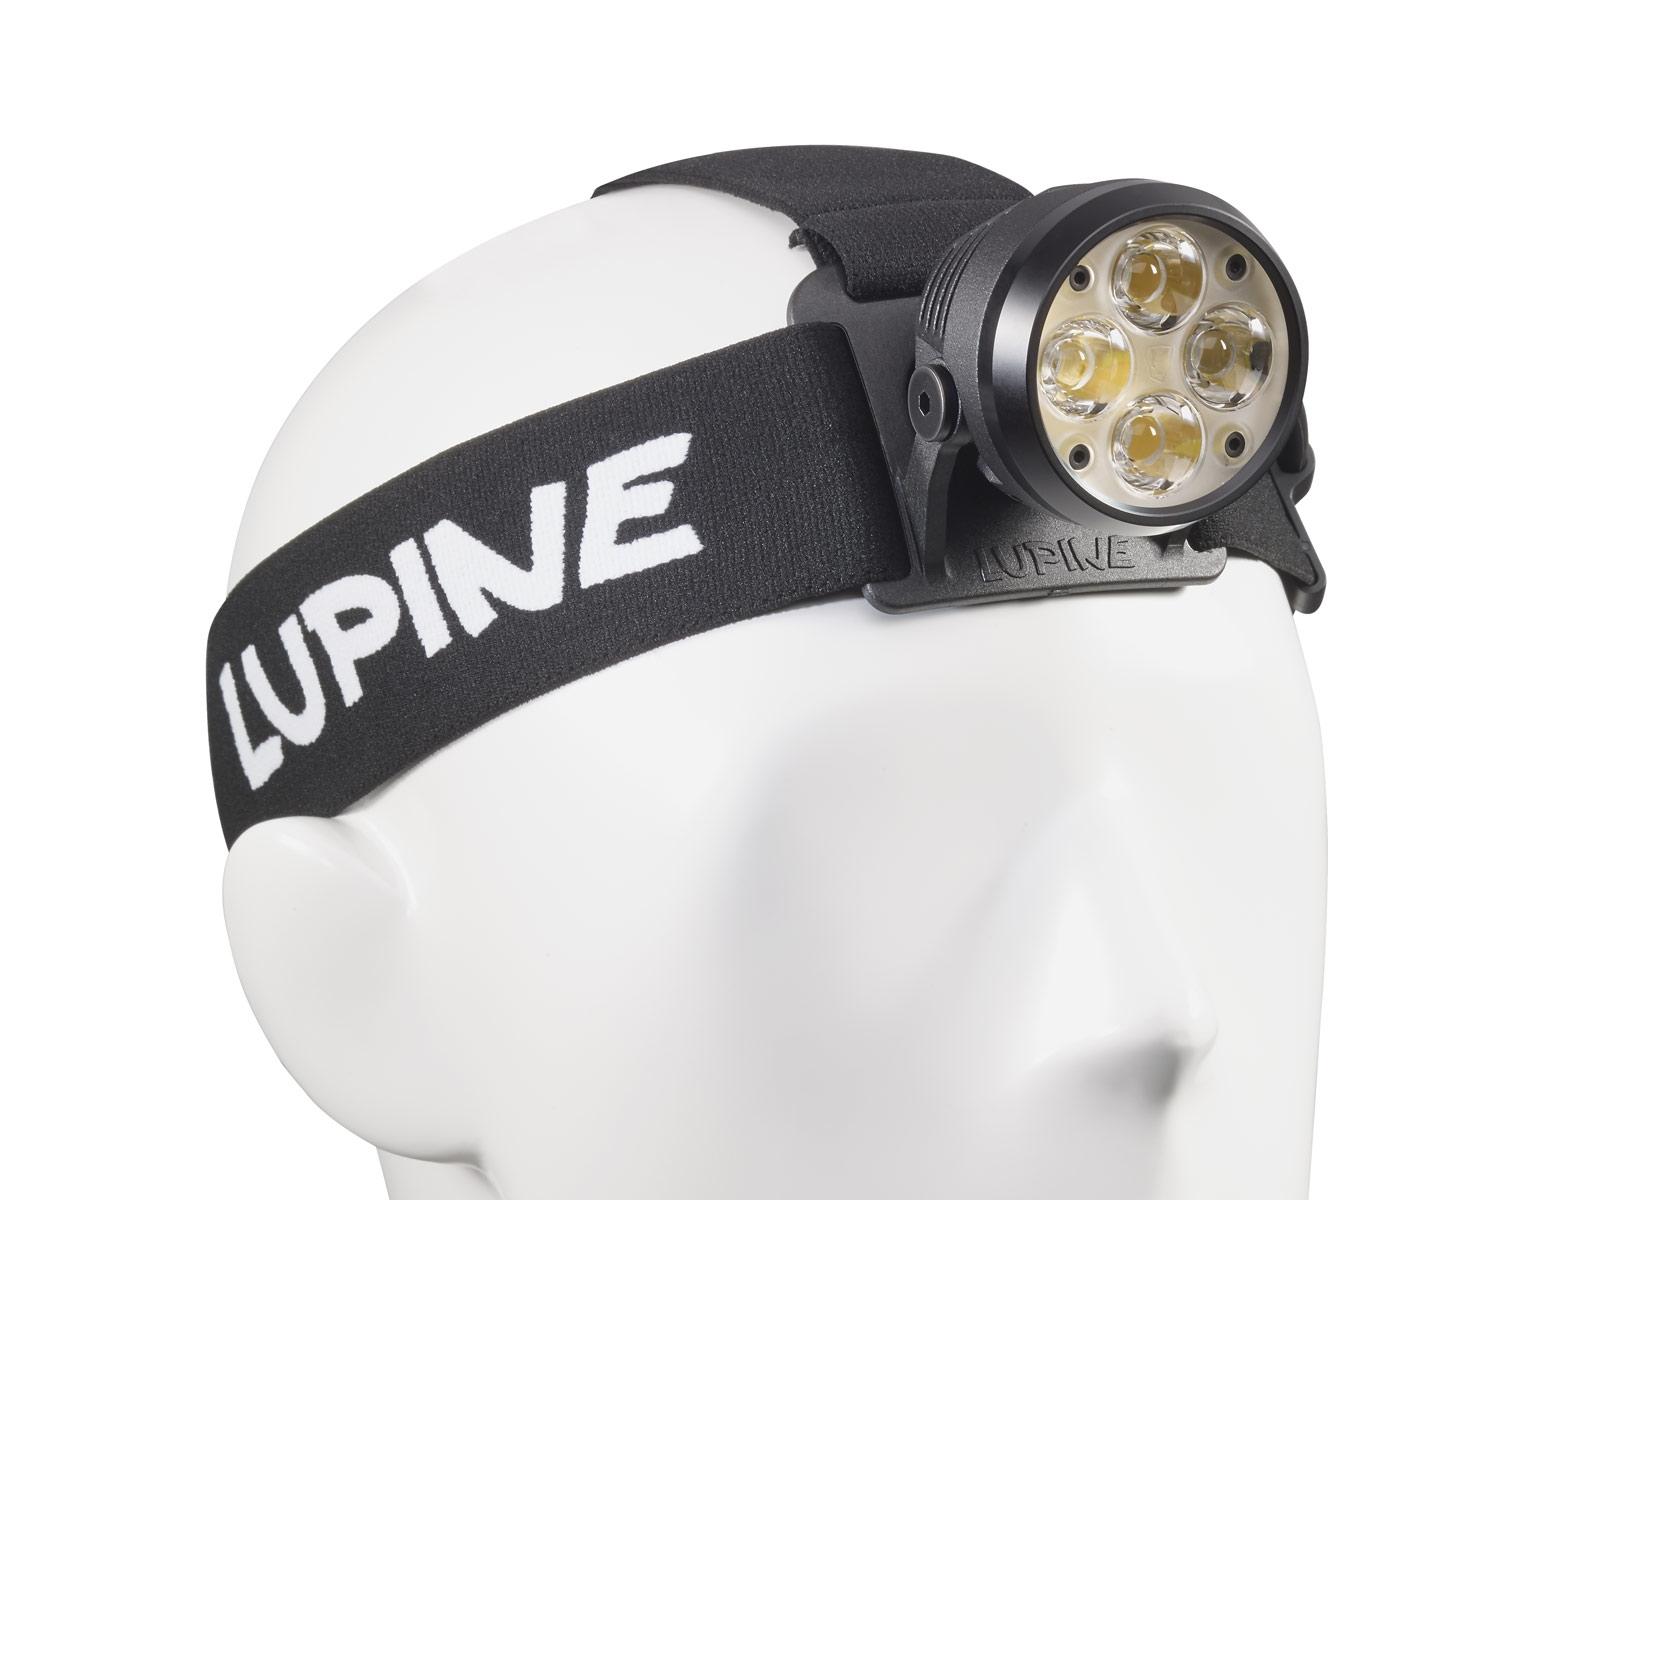 Lupine Wilma X 7 (3.200 Lumen)